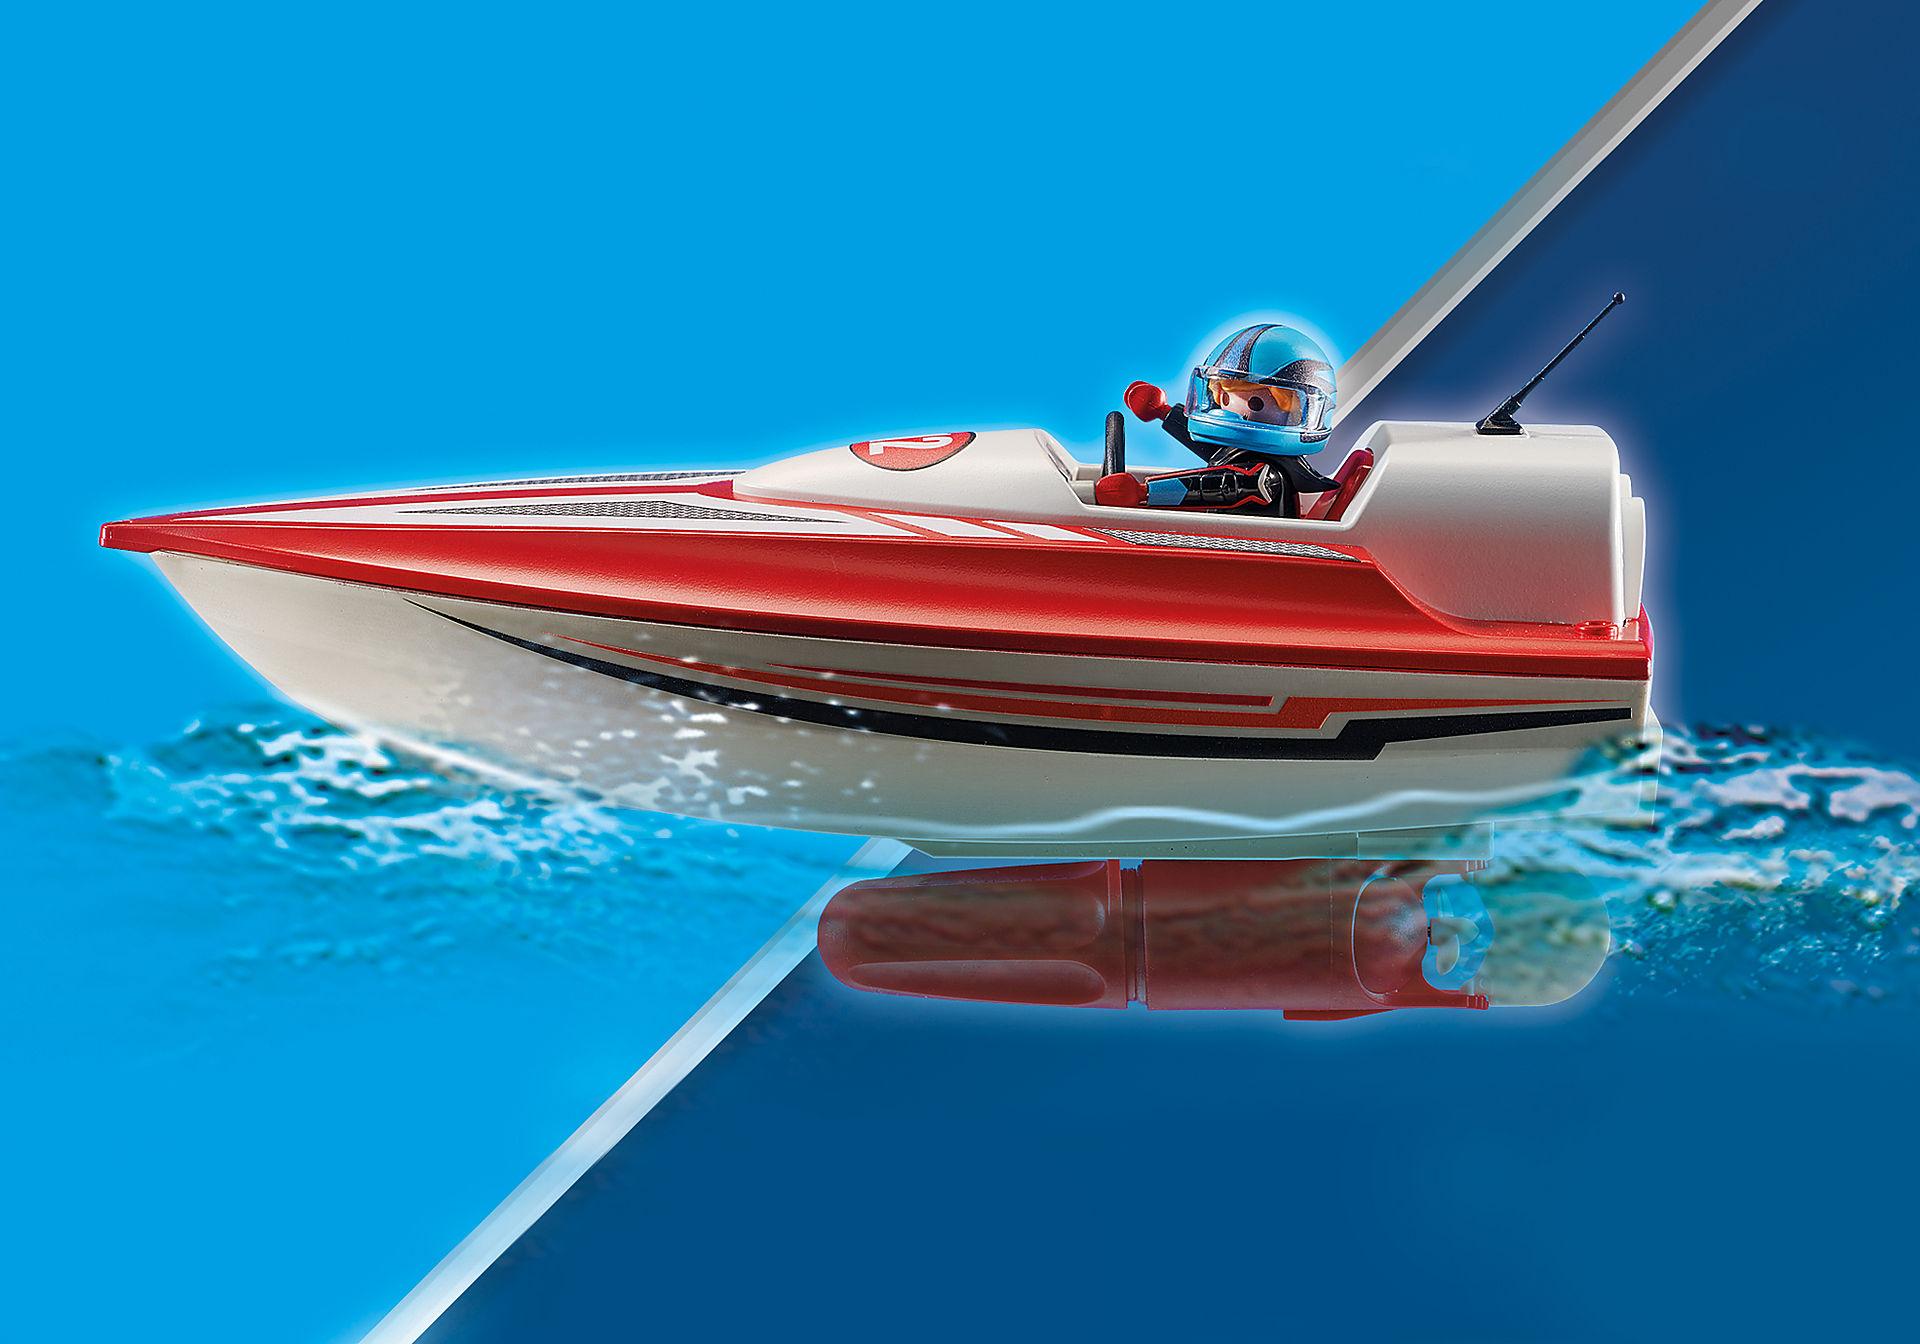 70744 Pikavene ja vedenalainen moottori zoom image5